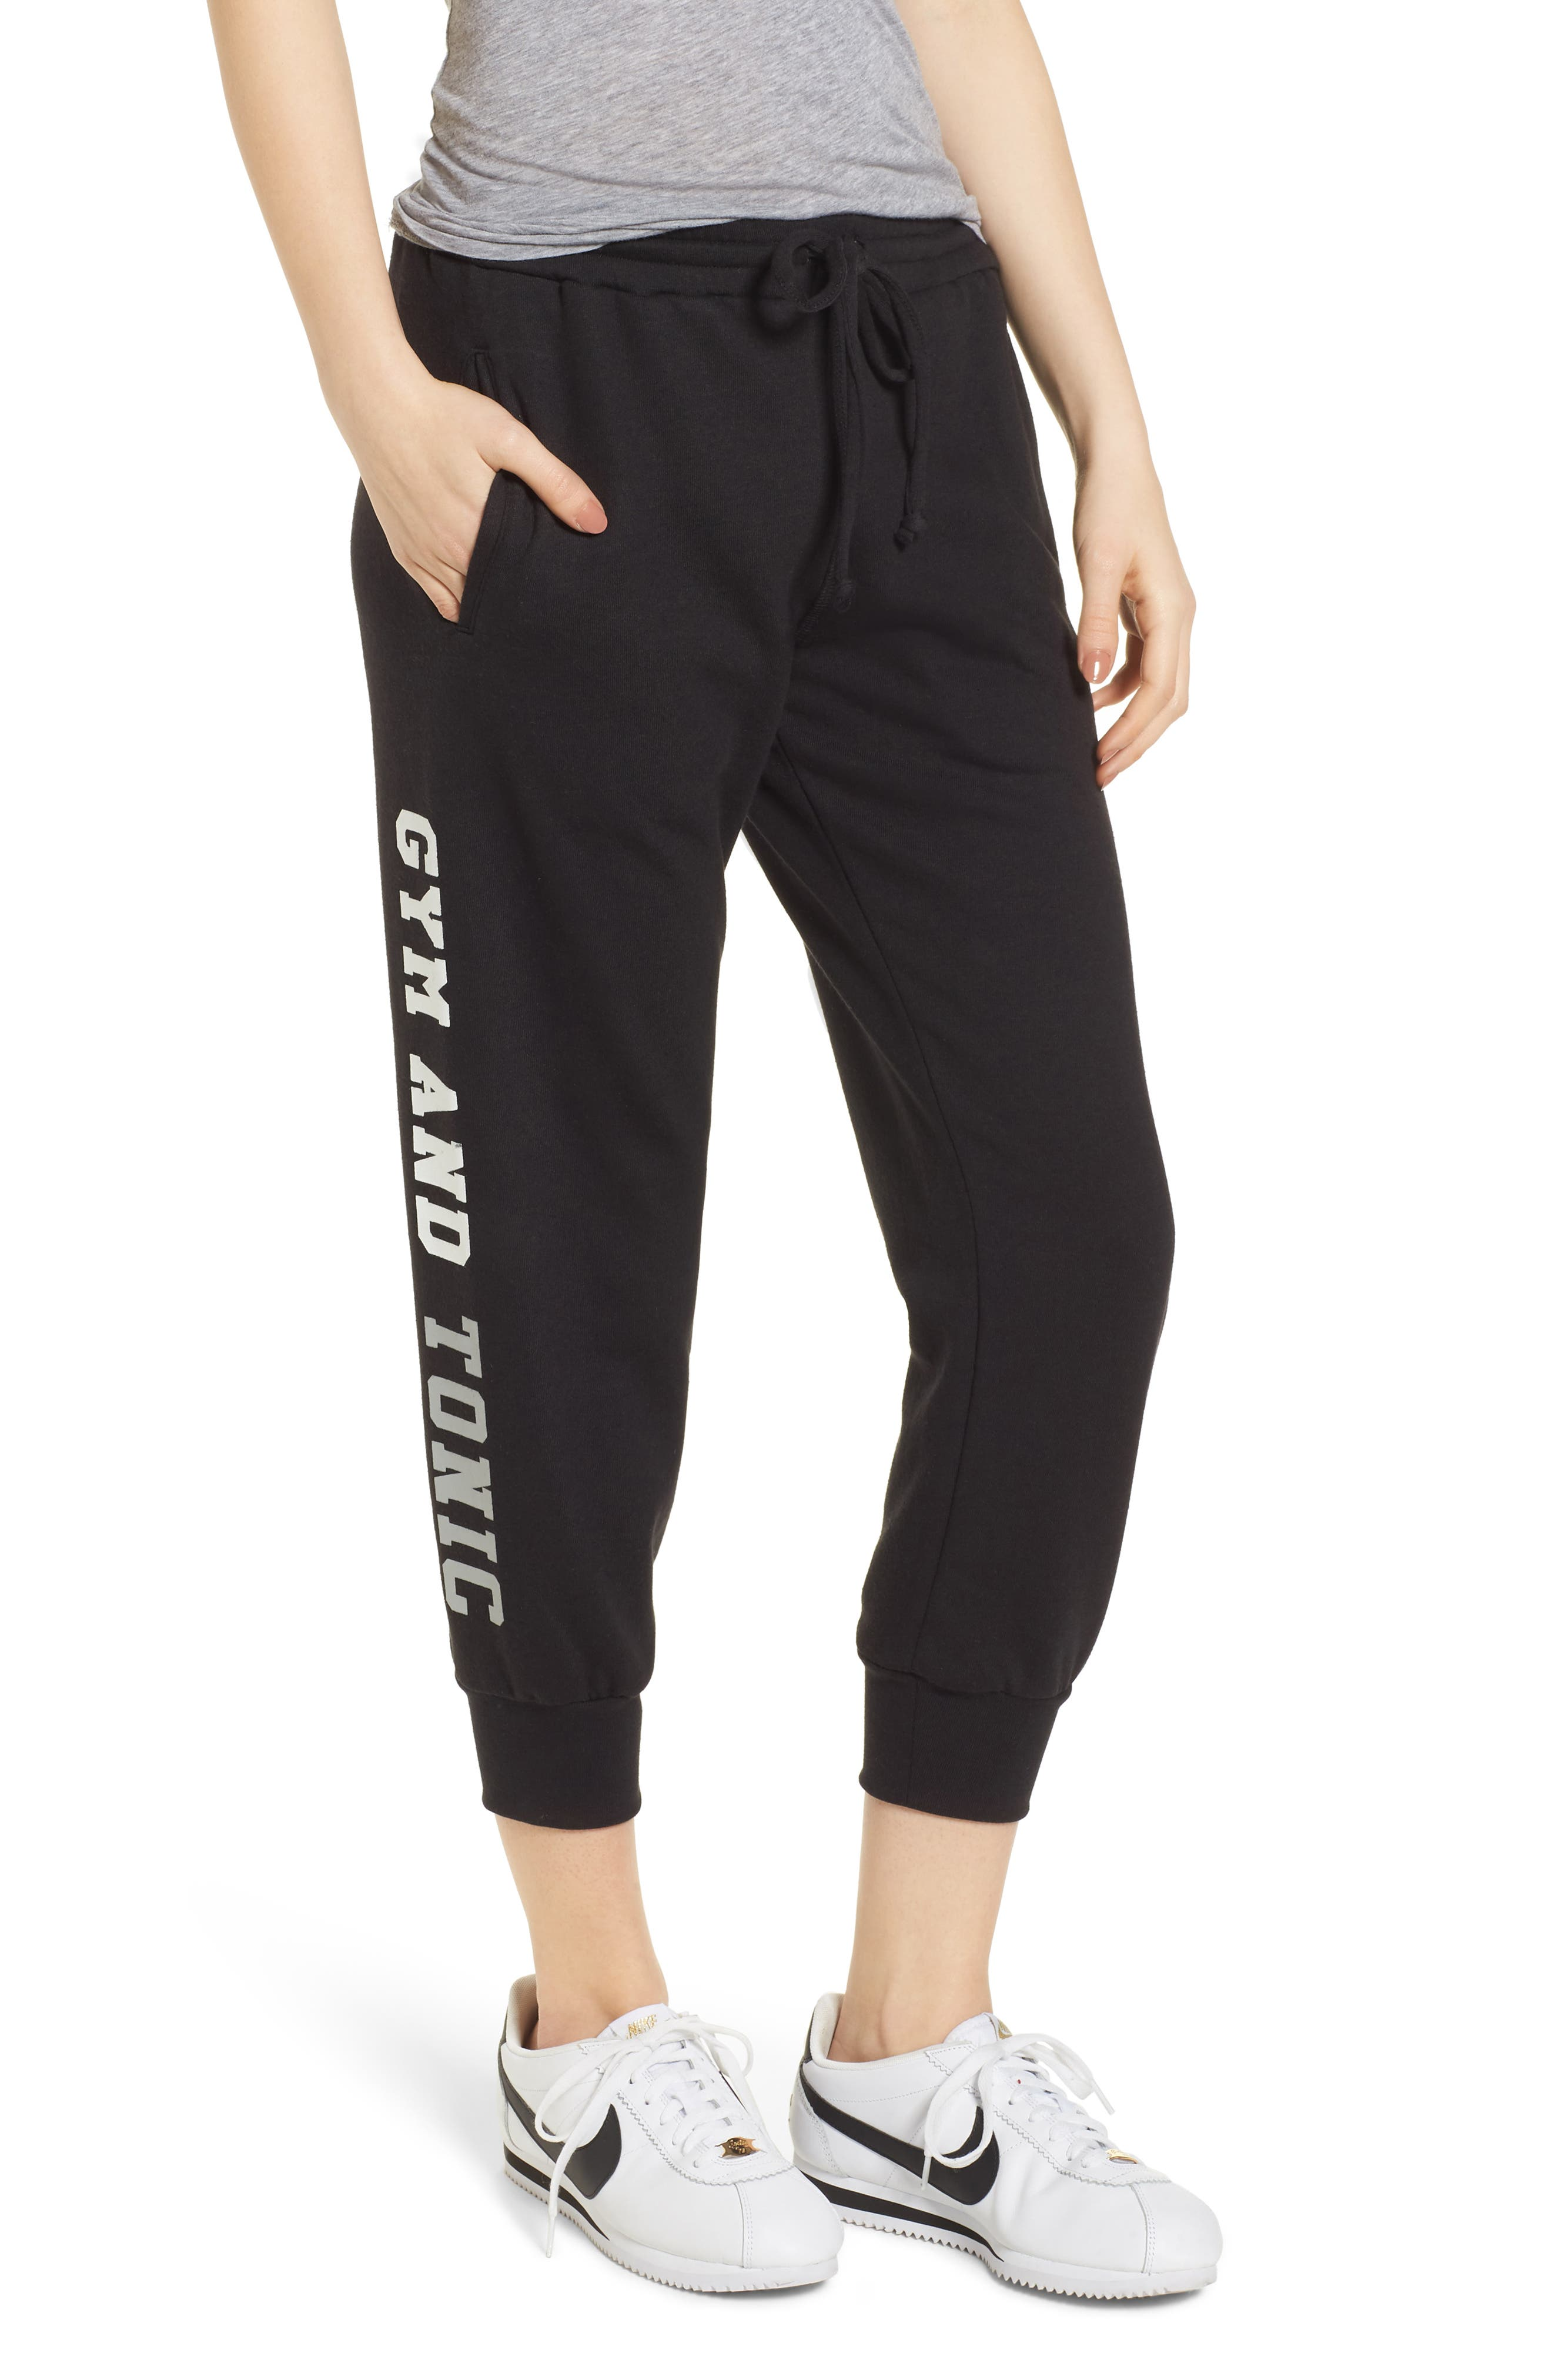 Sub_Urban Riot Gym & Tonic Crop Sweatpants